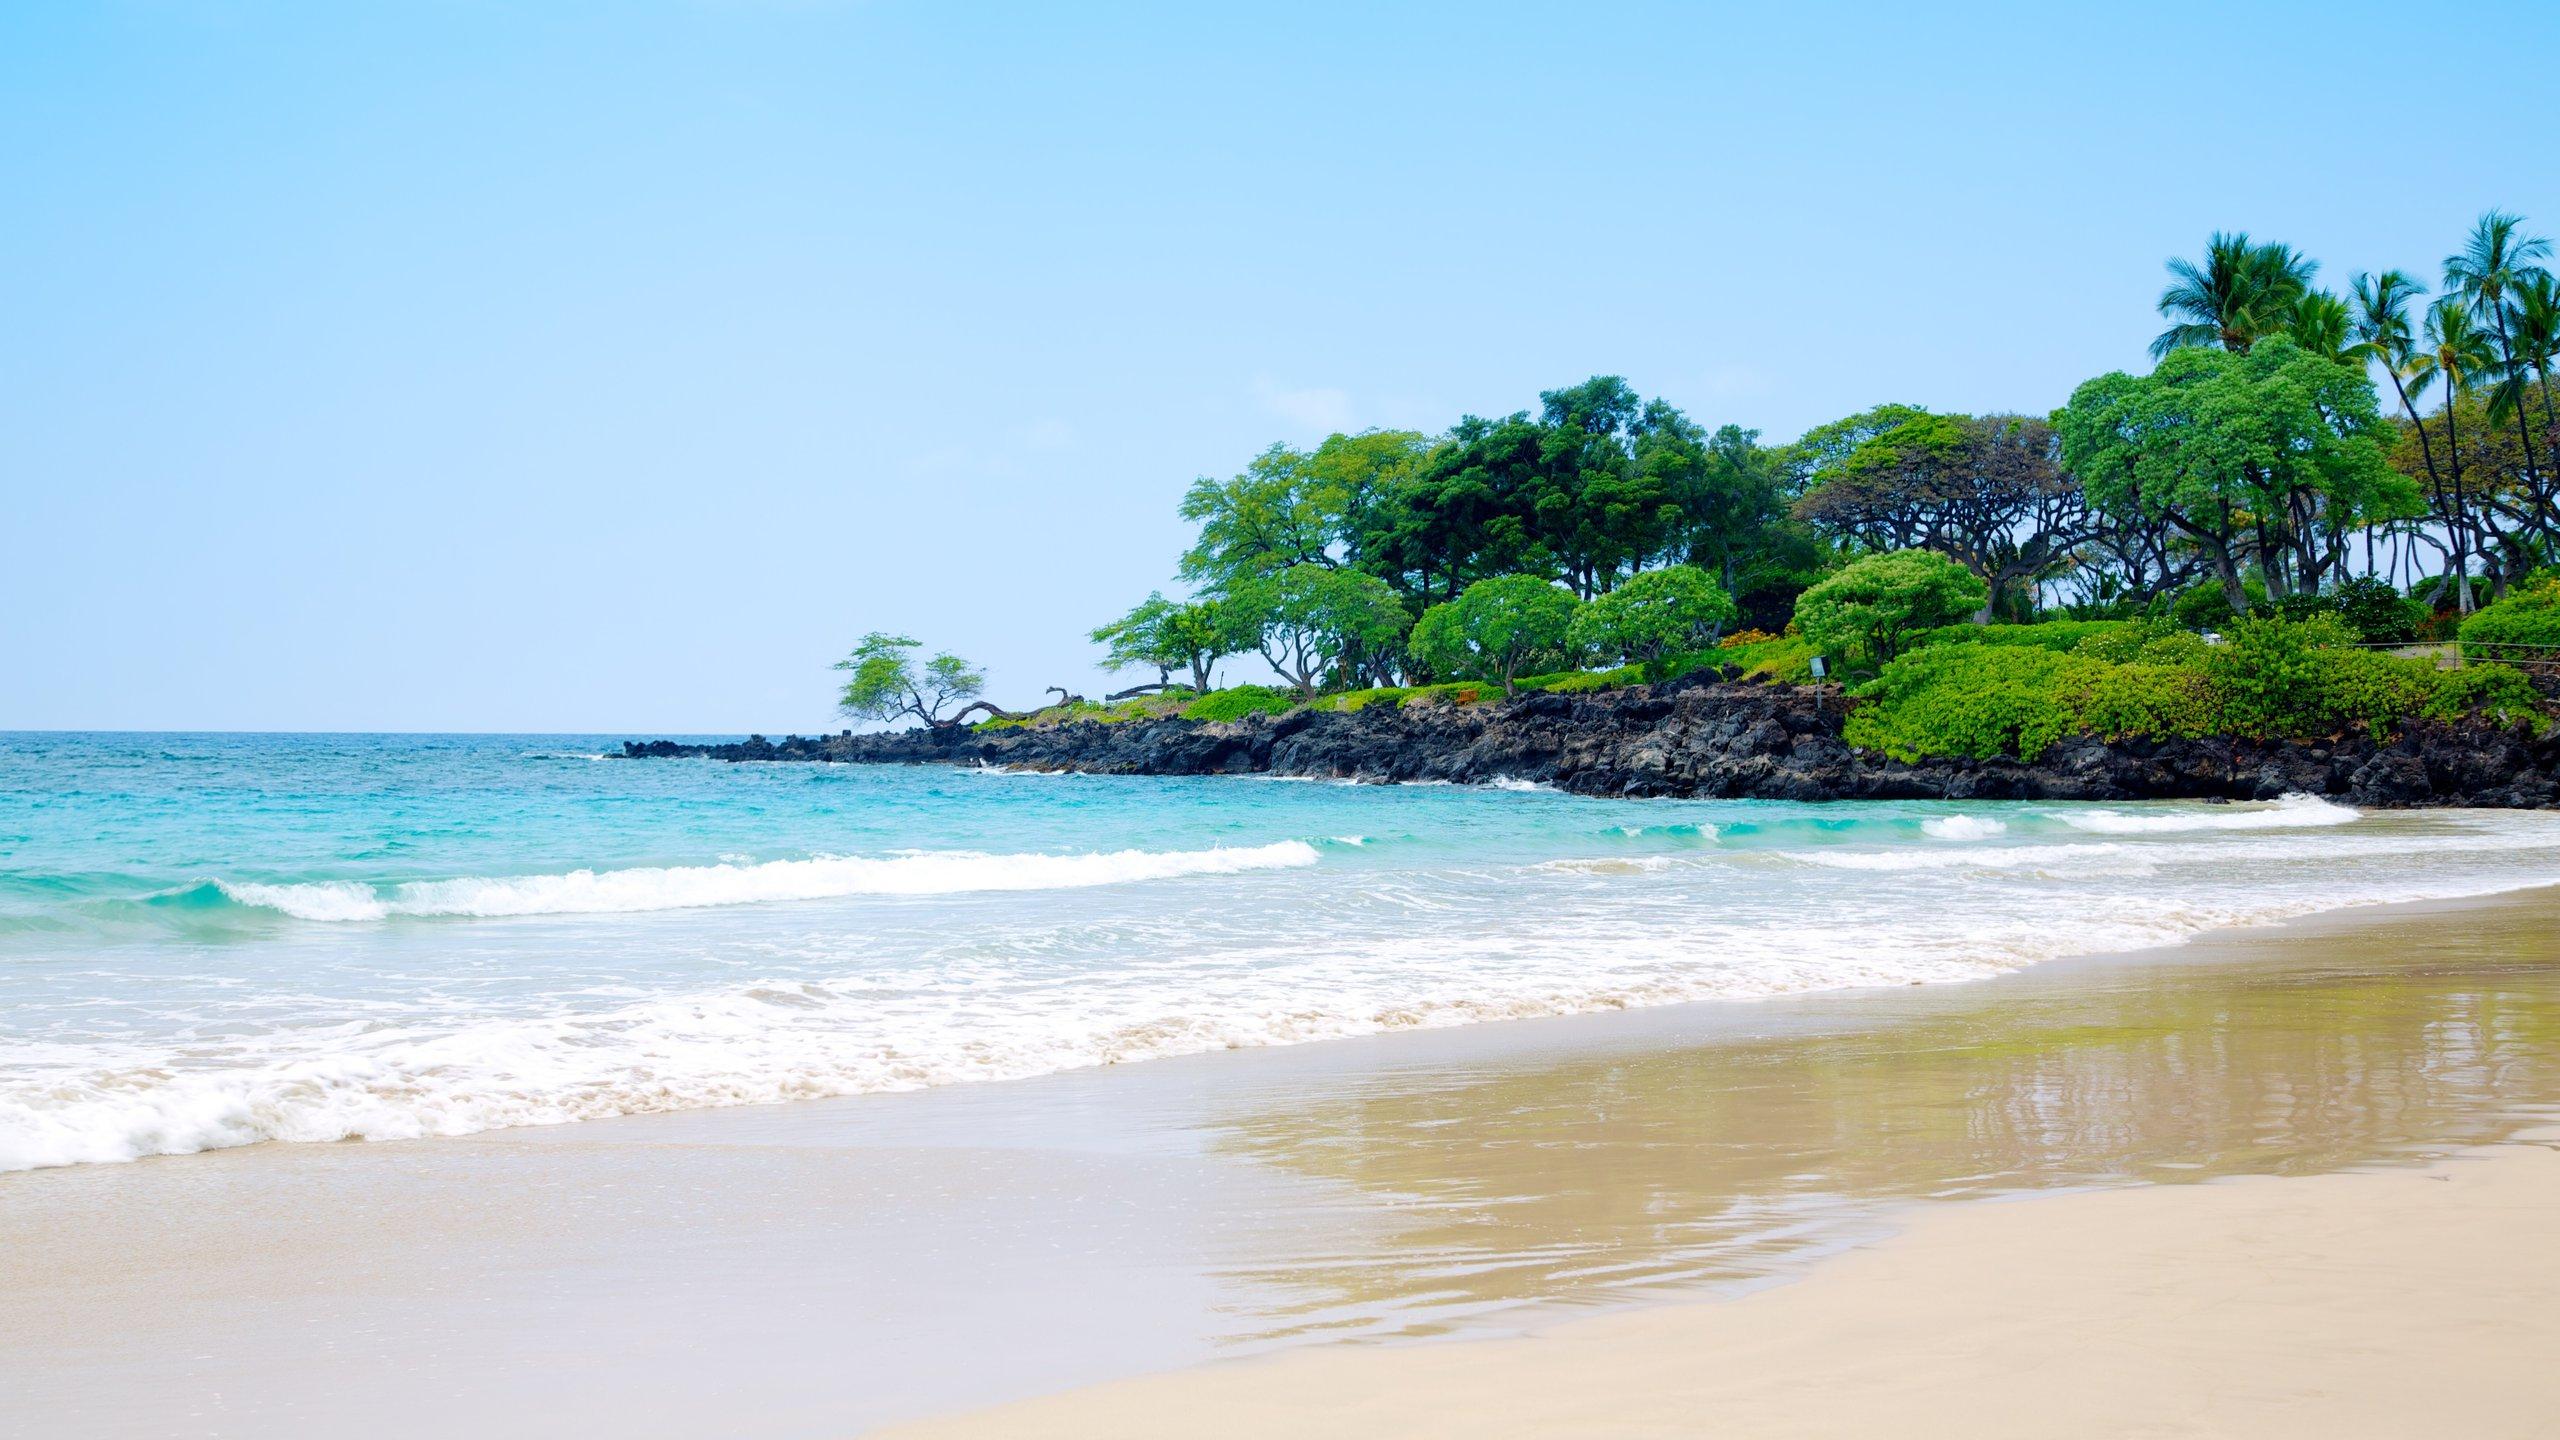 Mauna Kea Beach, Kamuela, Hawaii, United States of America